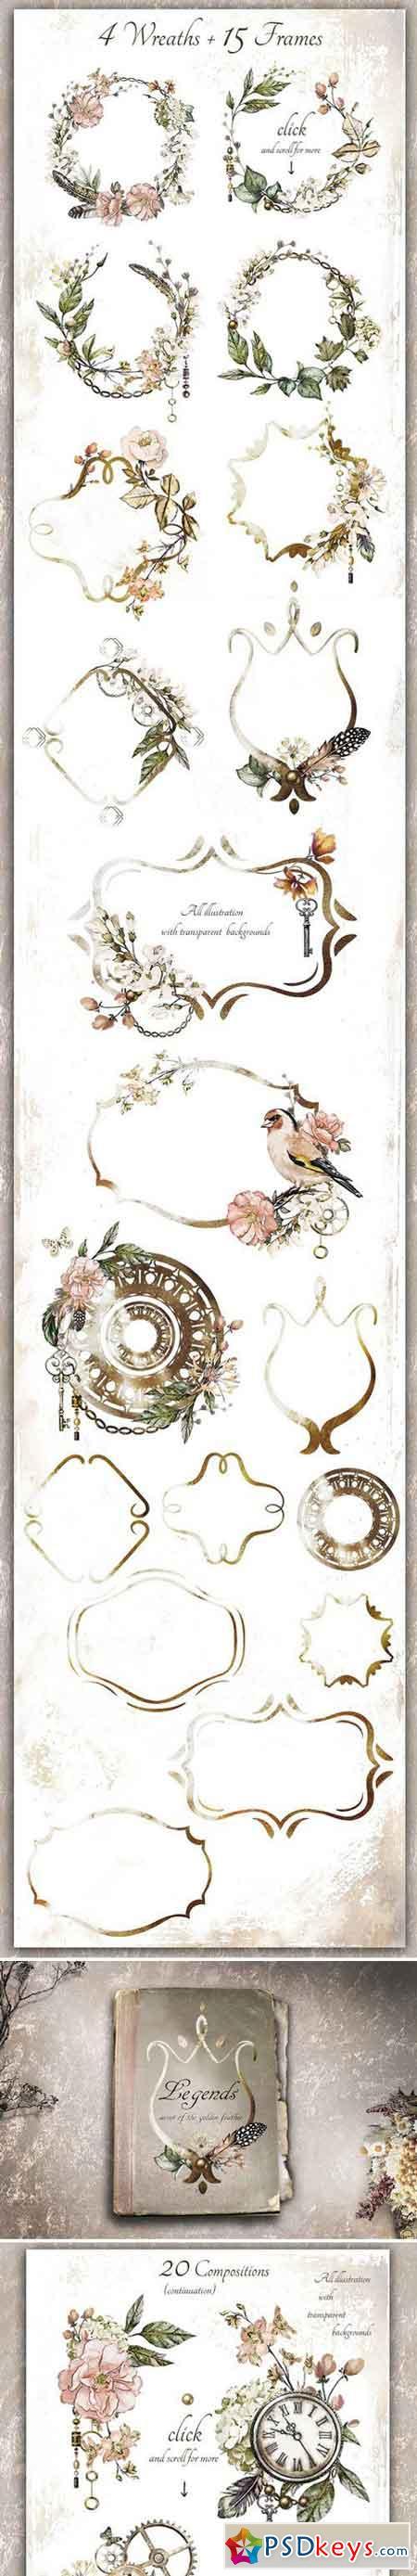 Watercolor collection - Legend 2227419